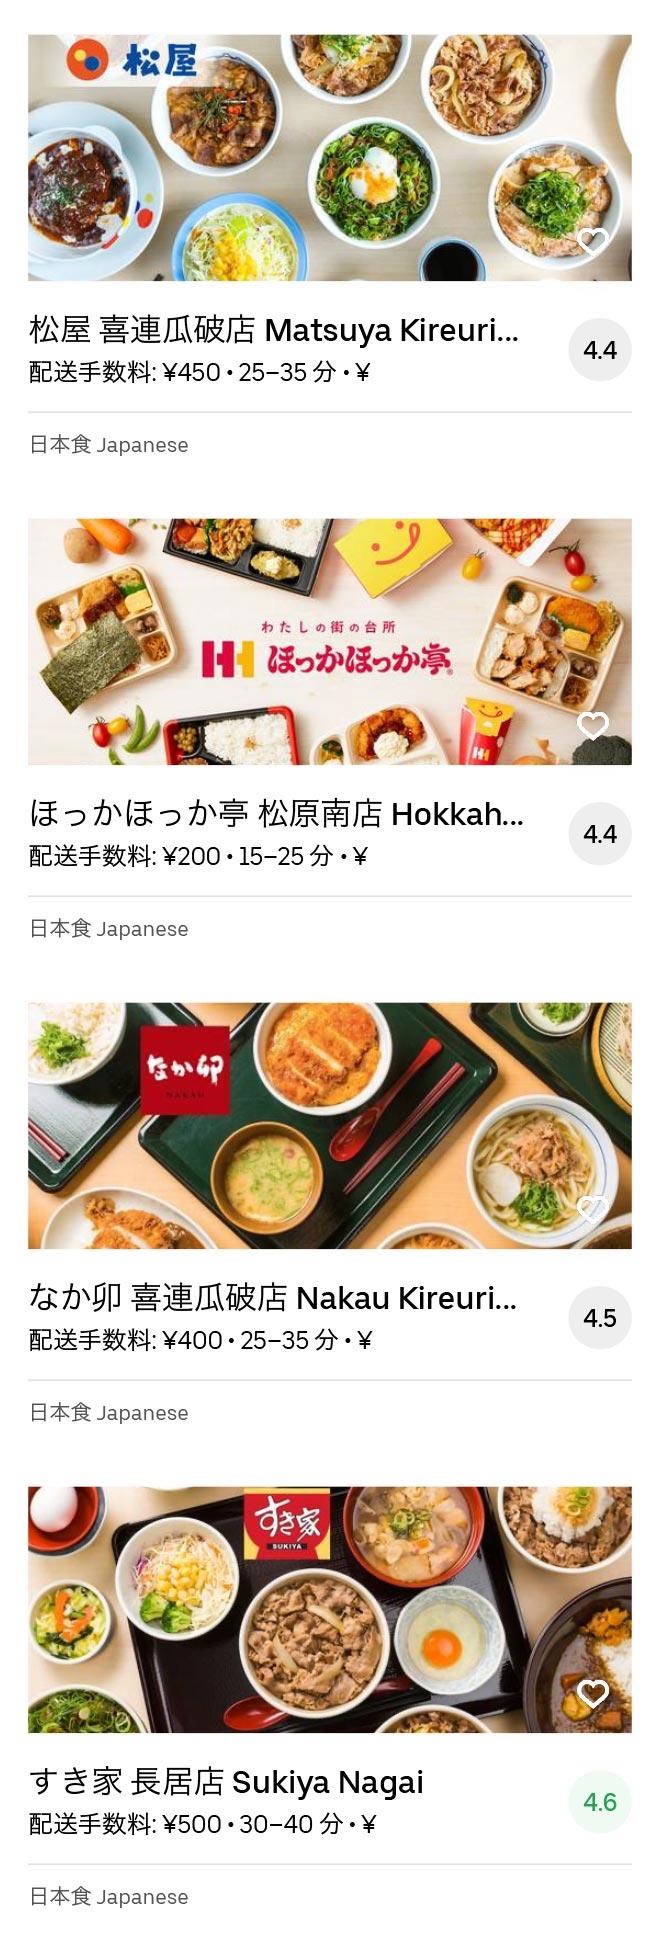 Kawachimatsubara menu 2005 06